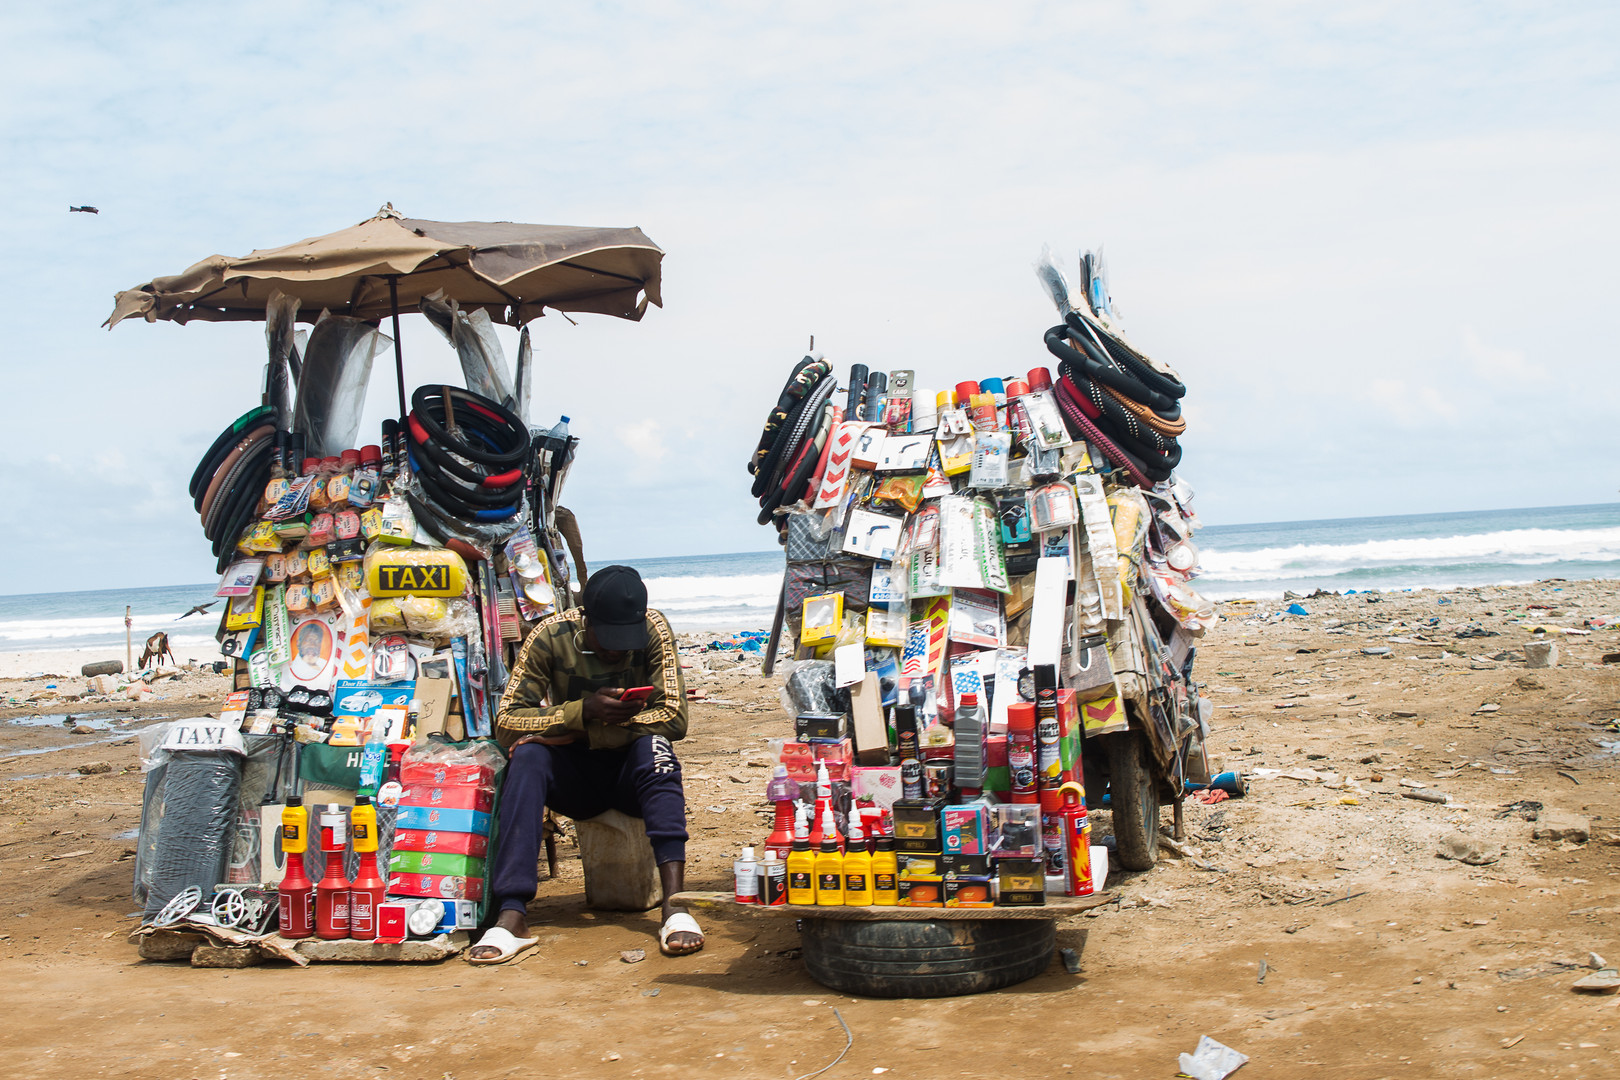 Plage de Camberene, Senegal